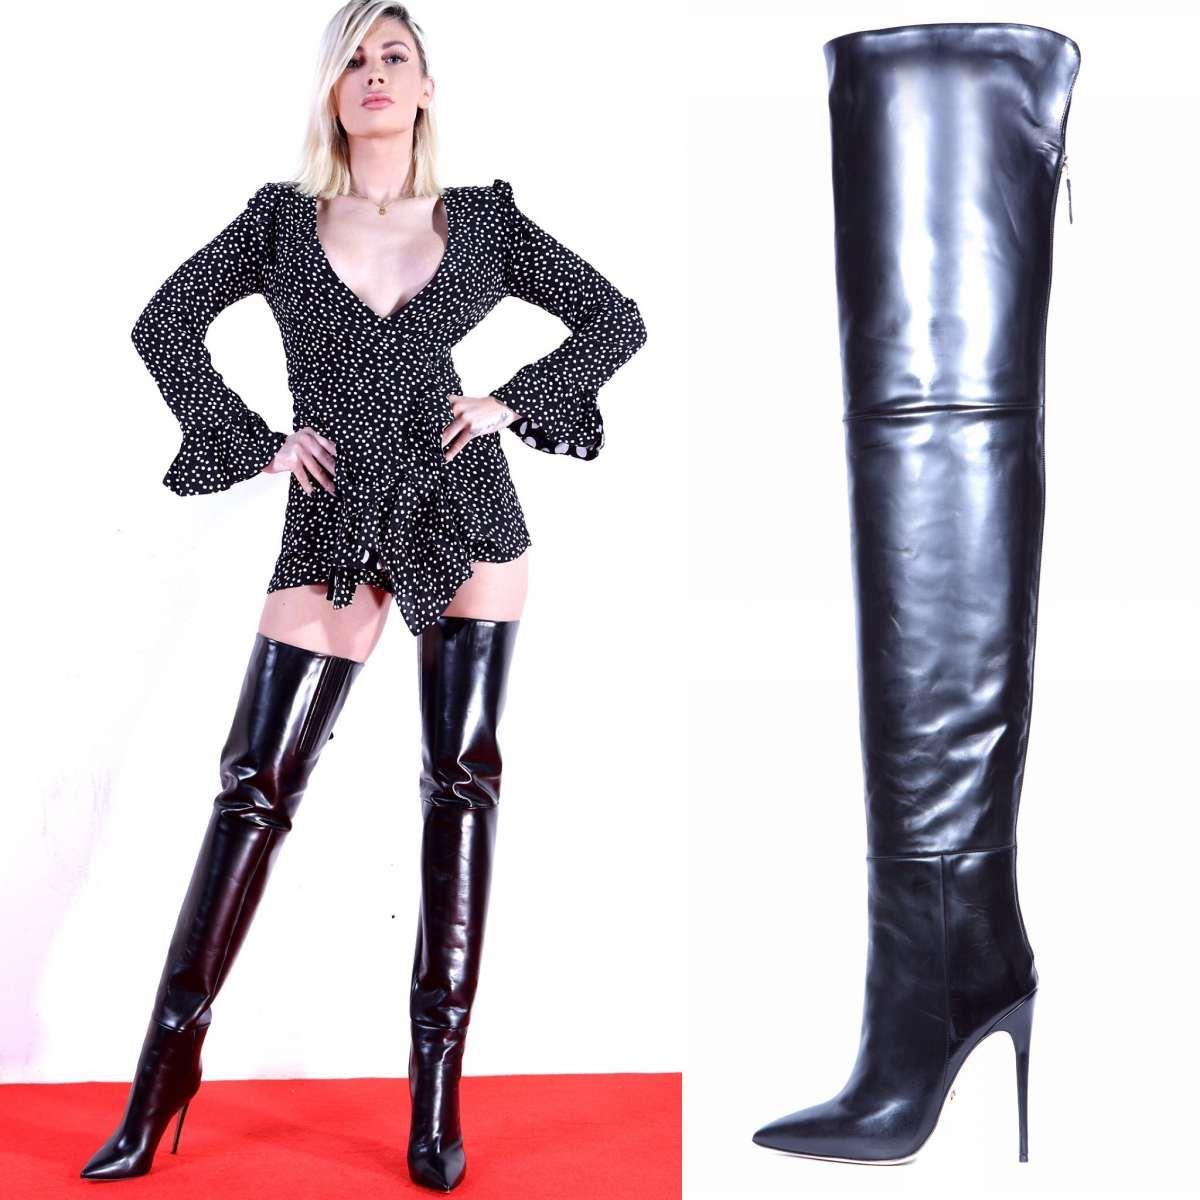 ALINA70 black   Overknee stiefel, Strumpfhosen outfit und